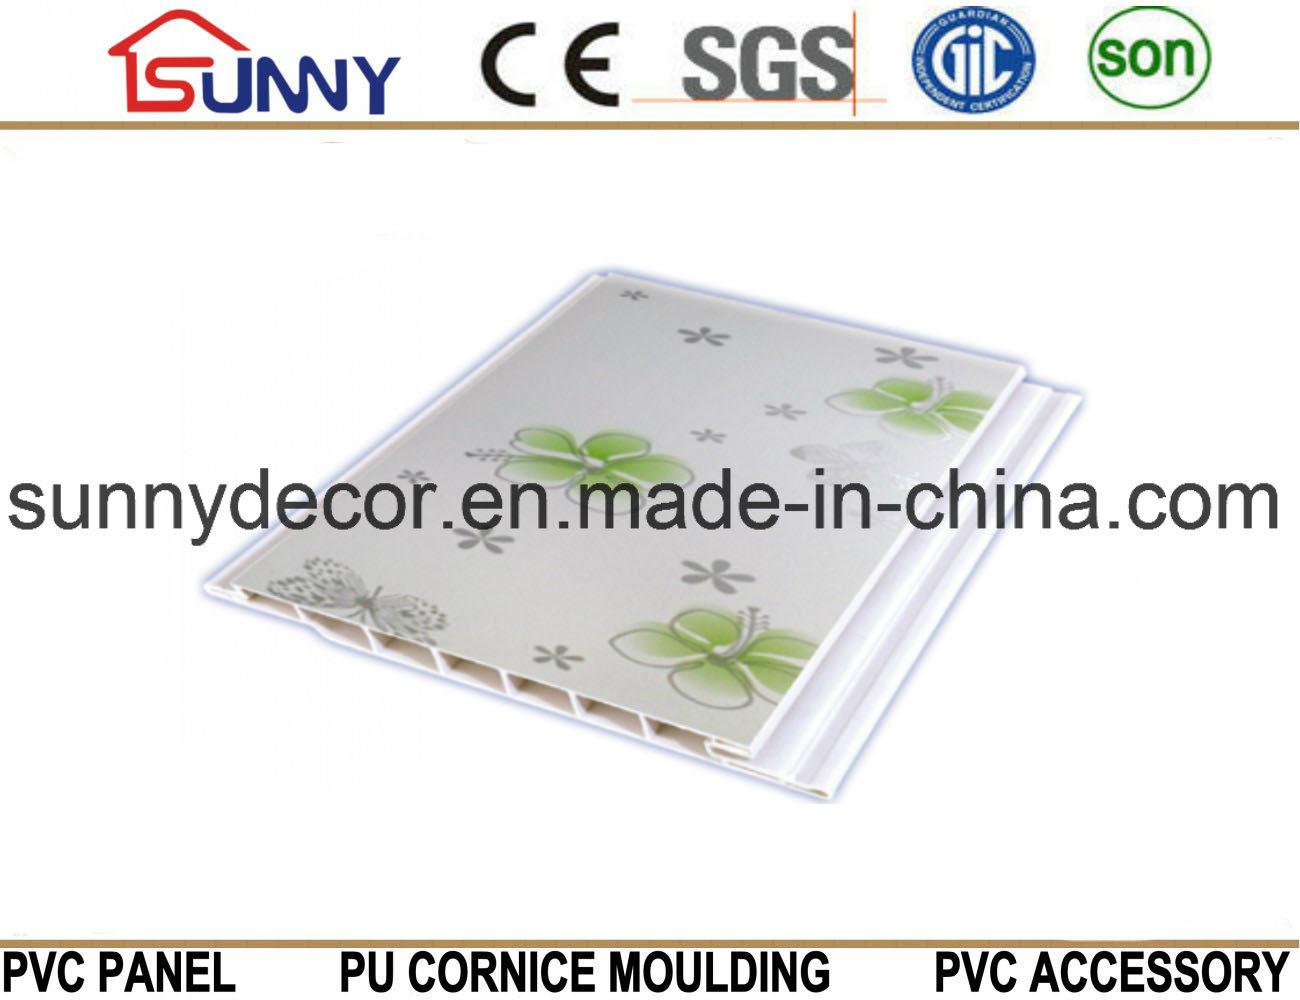 New Design PVC Panel-PVC-Ceiling-PVC Wall Panel-PVC Printing Panel